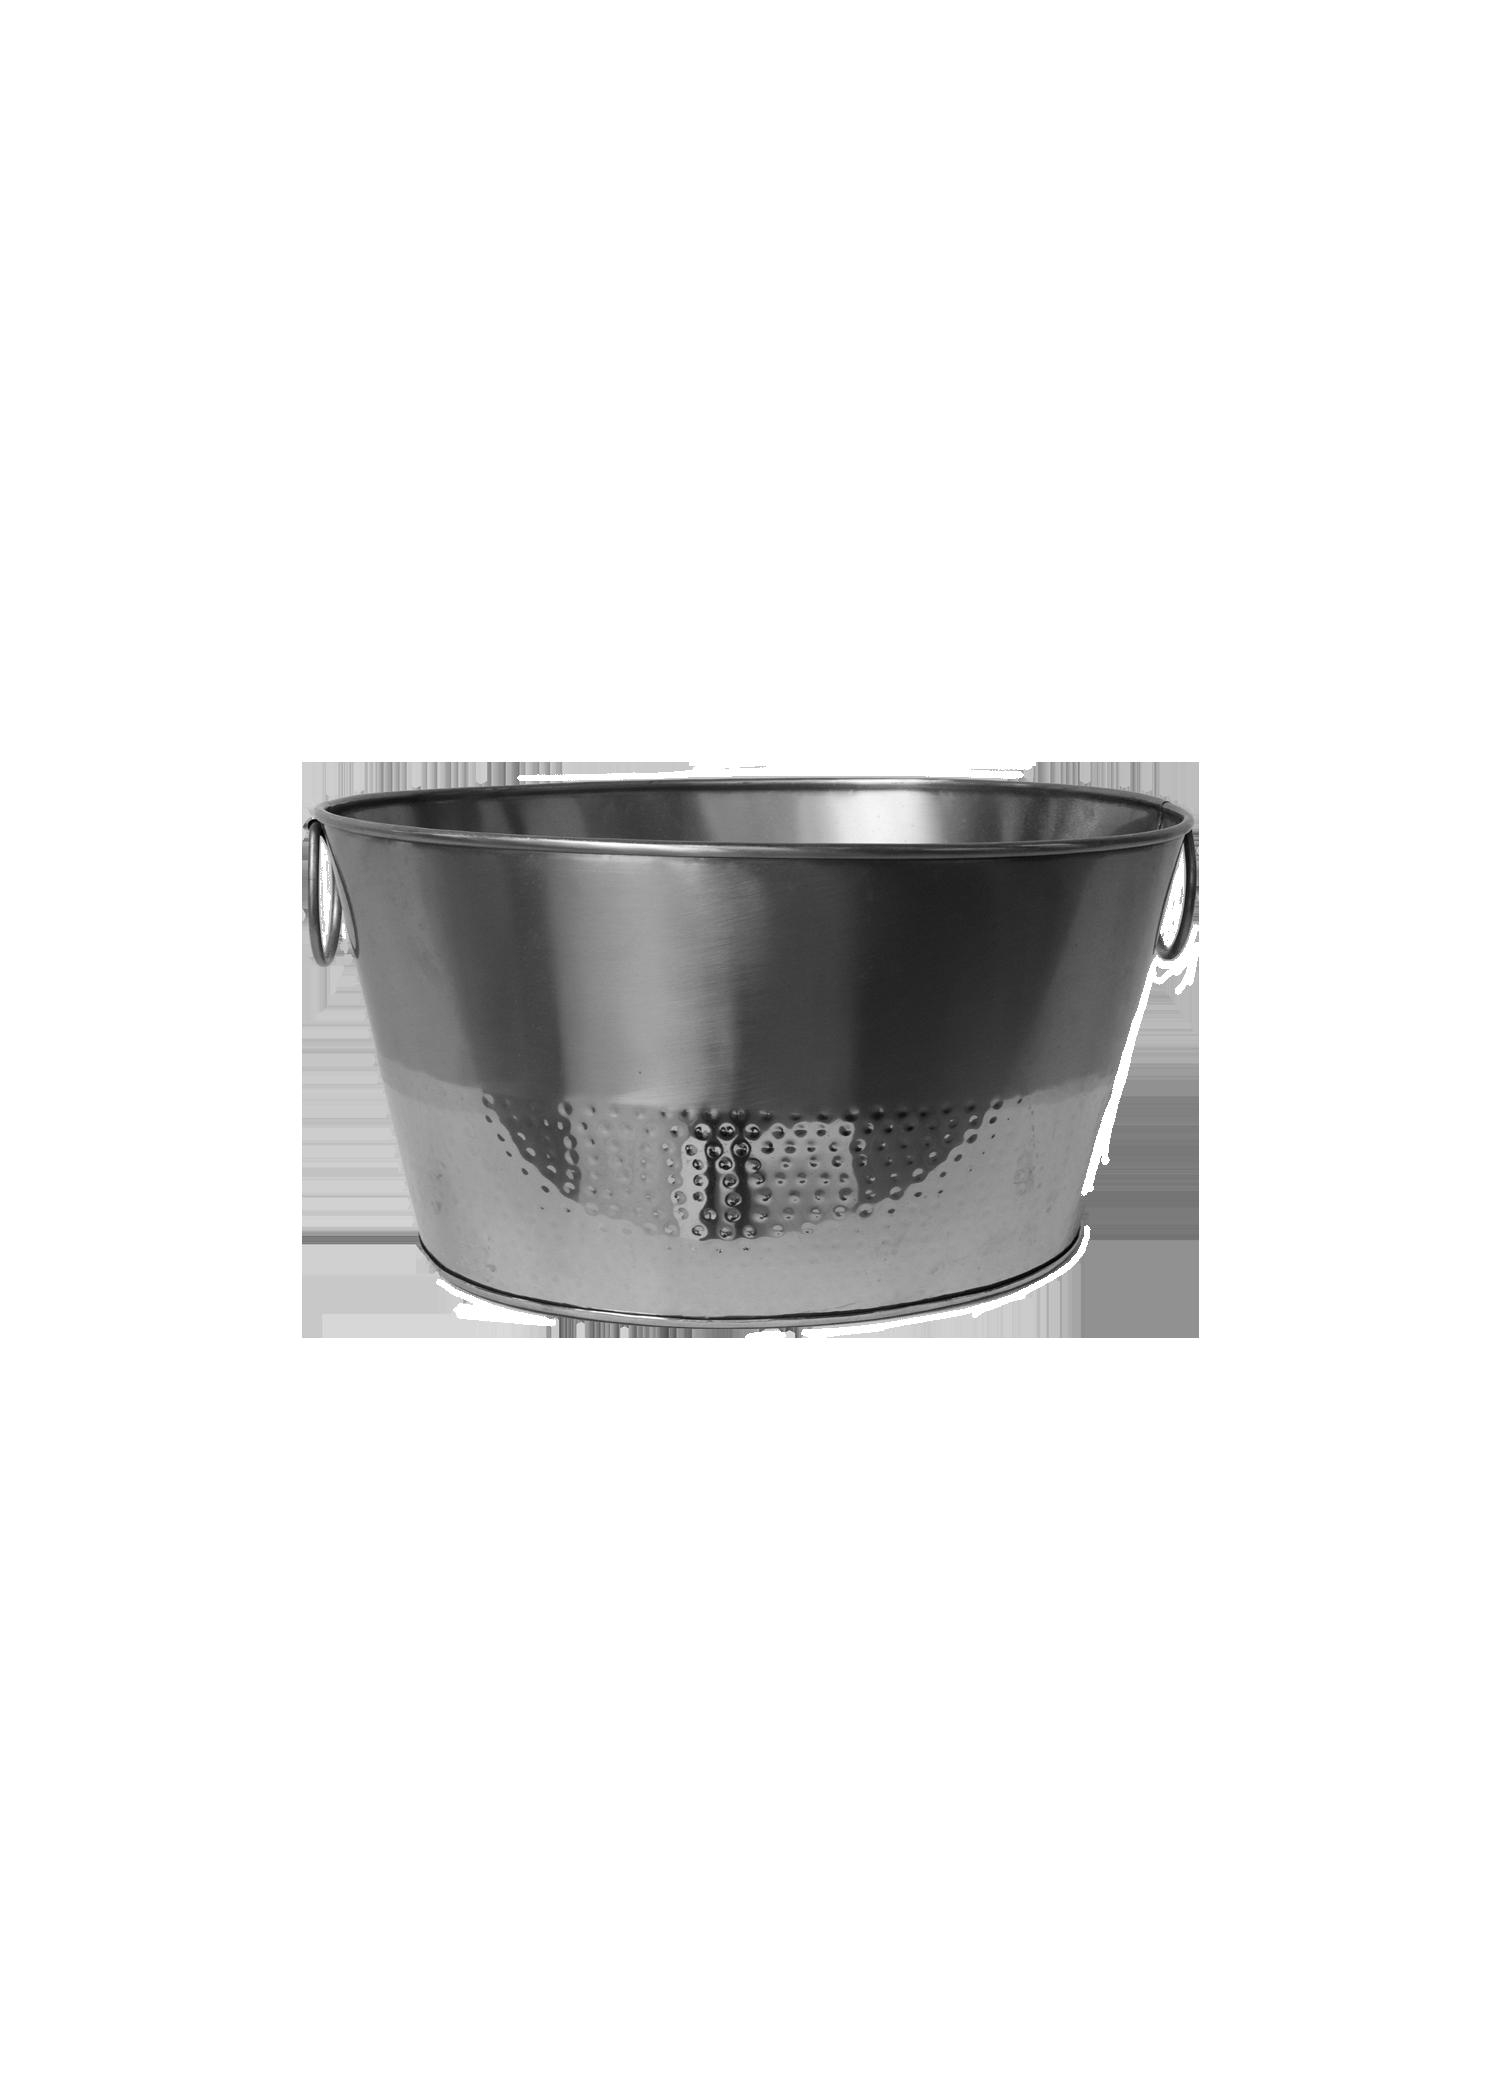 $20 Small Galvanized Tub